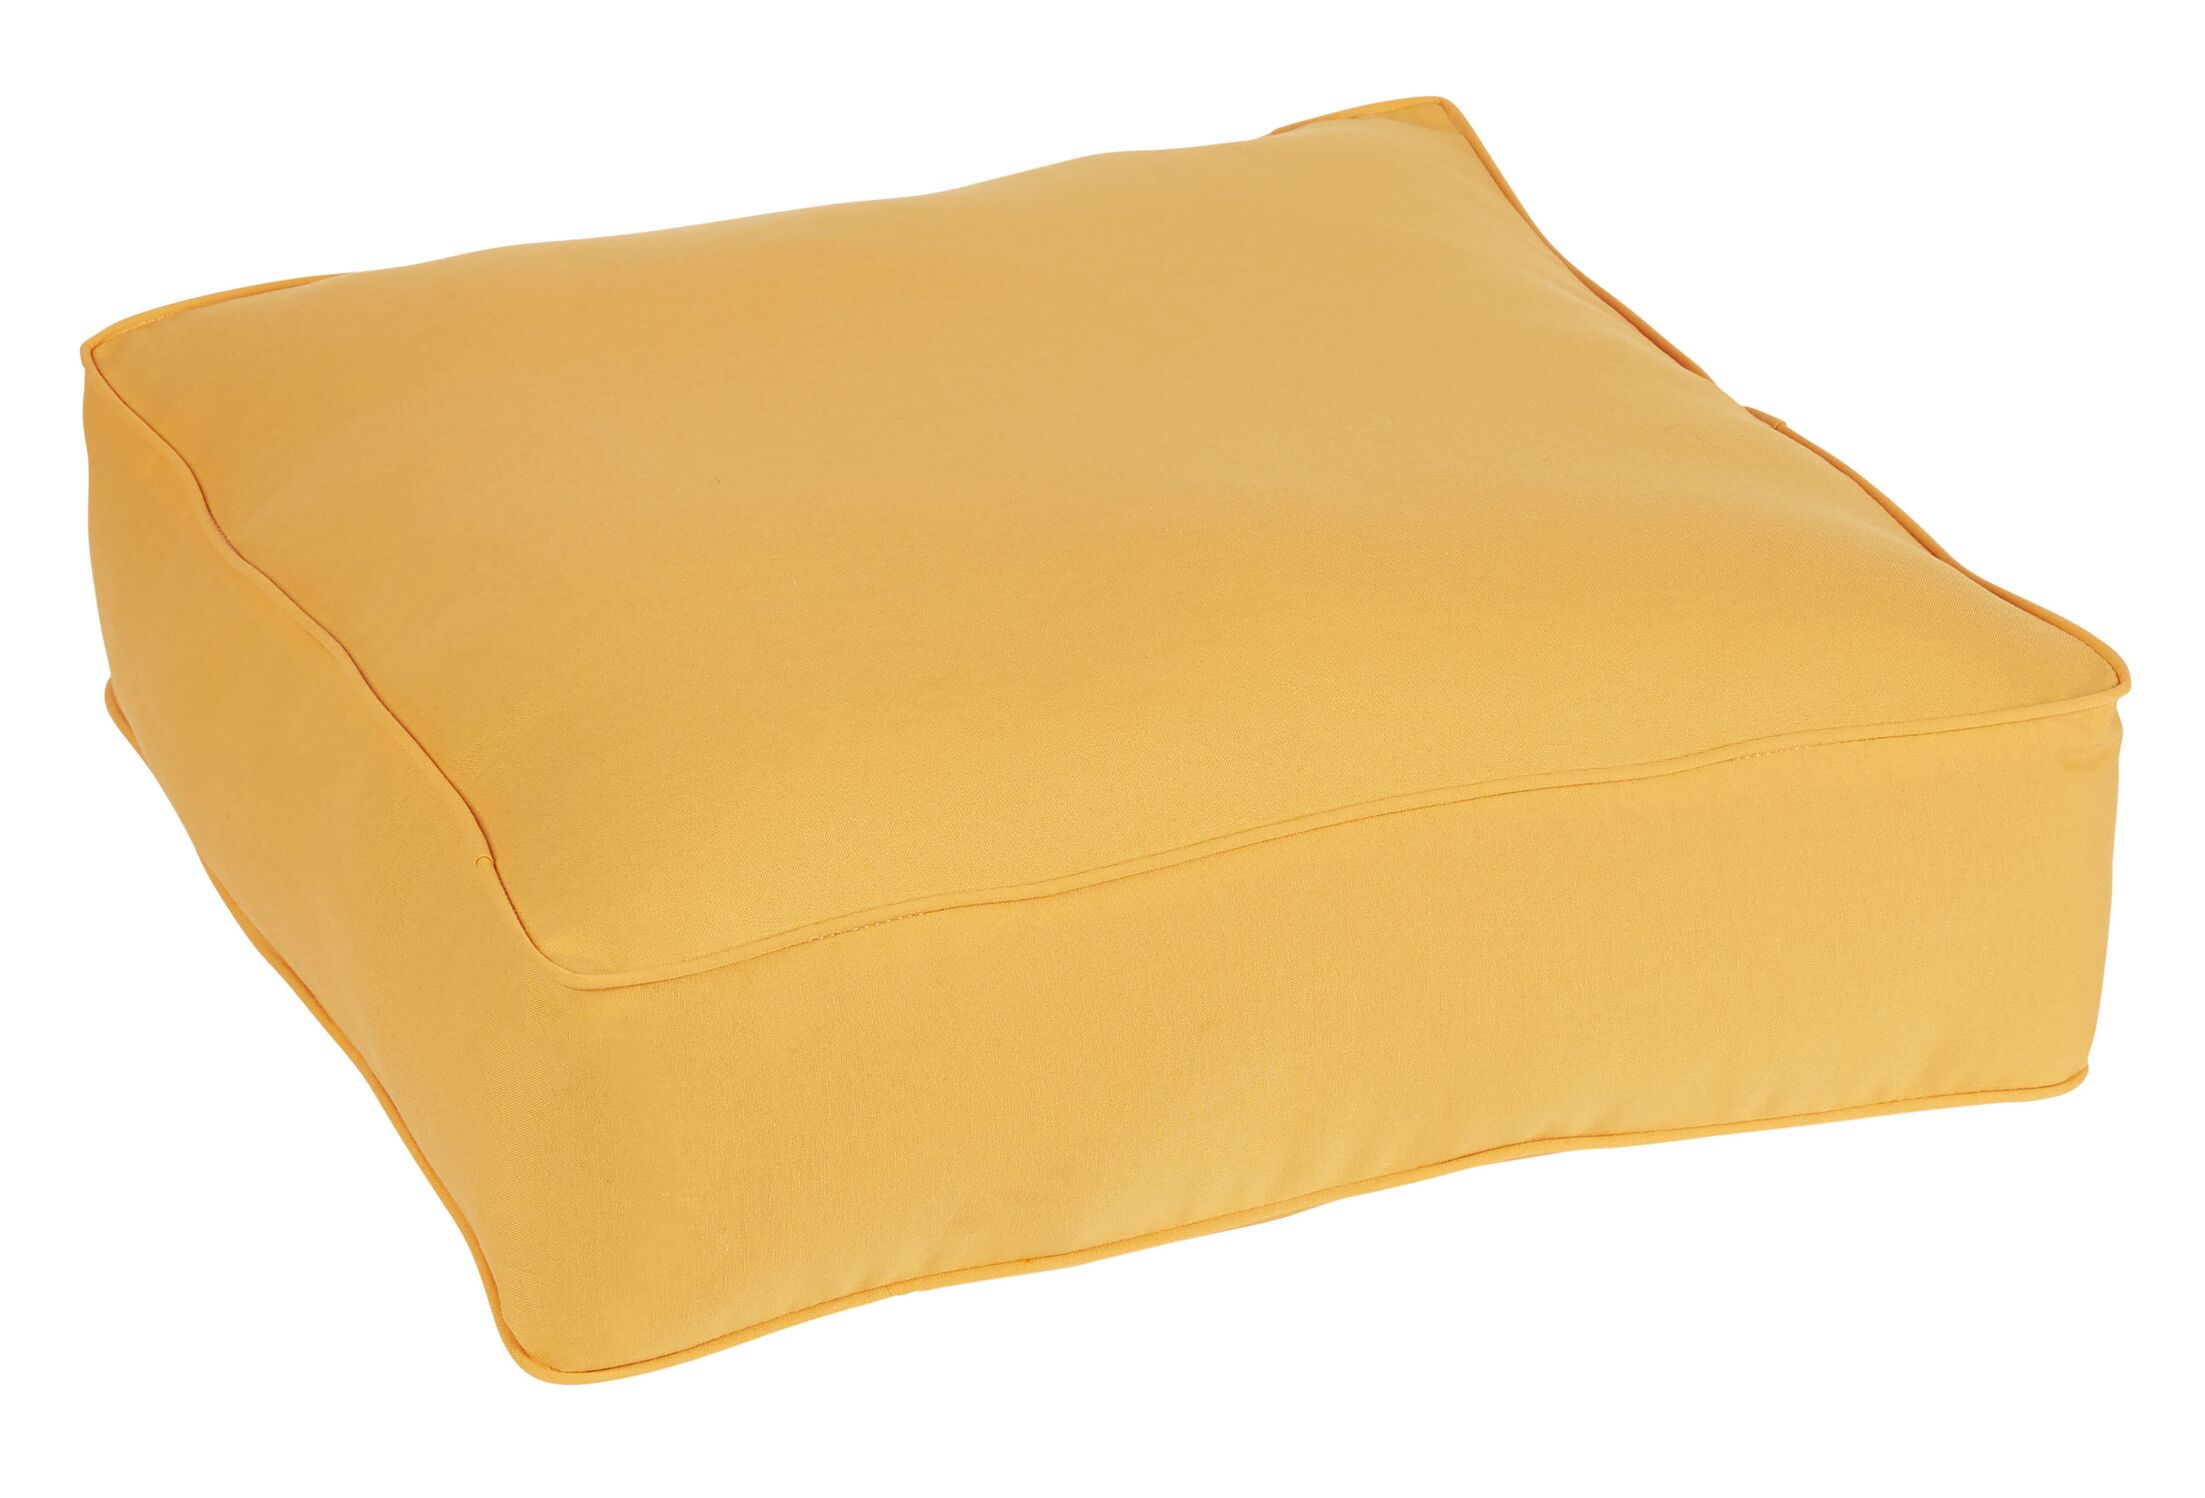 Keila Indoor/Outdoor Euro Pillow Color: Orange